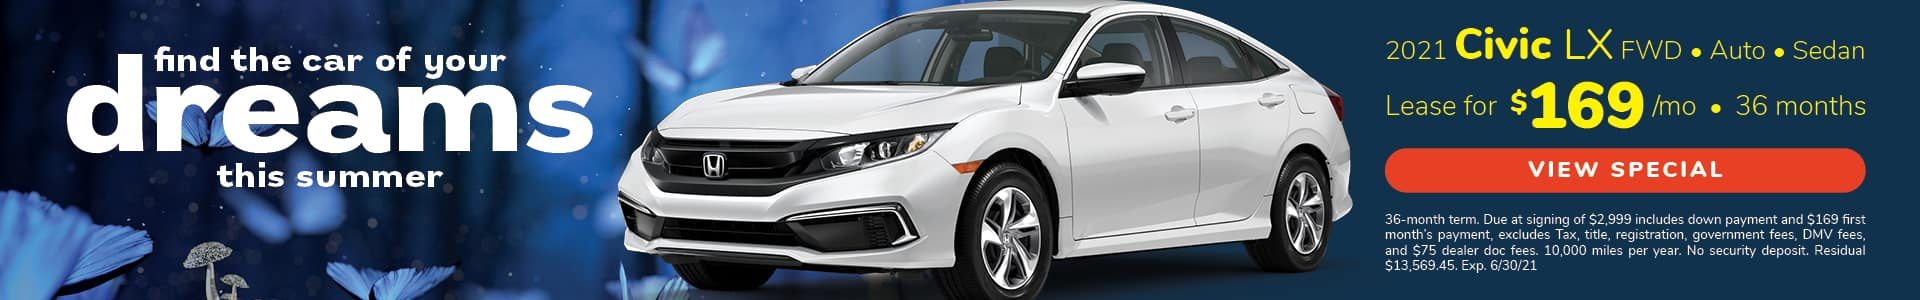 Lease 2021 Civic LX